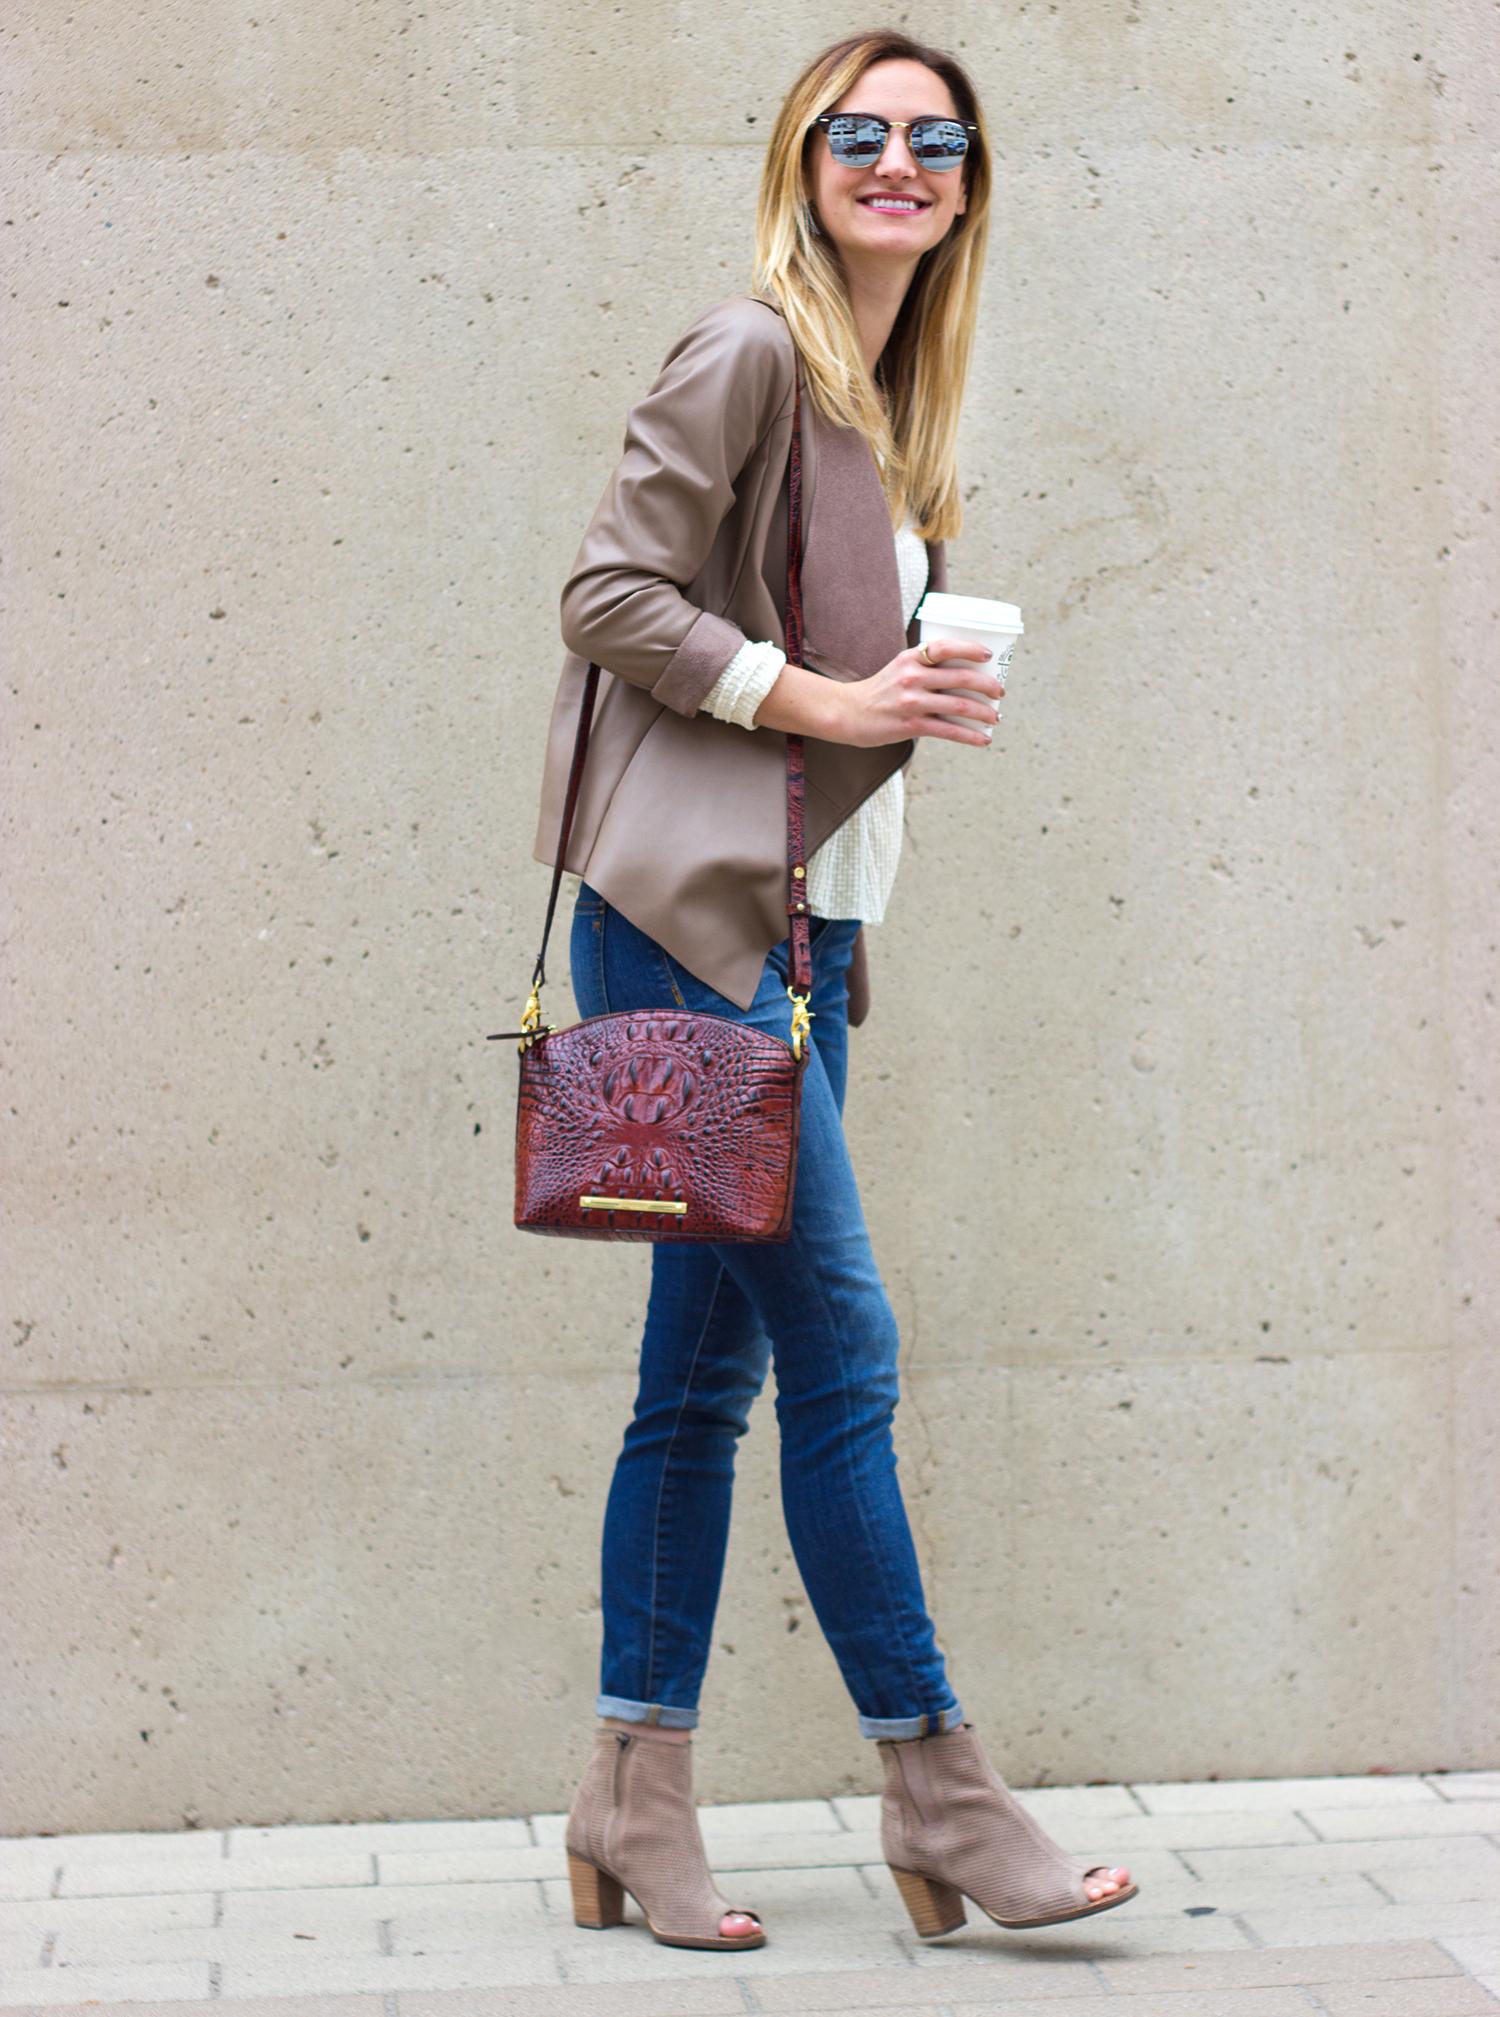 livvyland-blog-olivia-watson-austin-texas-fashion-blogger-madewell-skinny-jeans-bb-dakota-bradford-tan-draped-front-jacket-brahmin-toms-majorca-booties-3